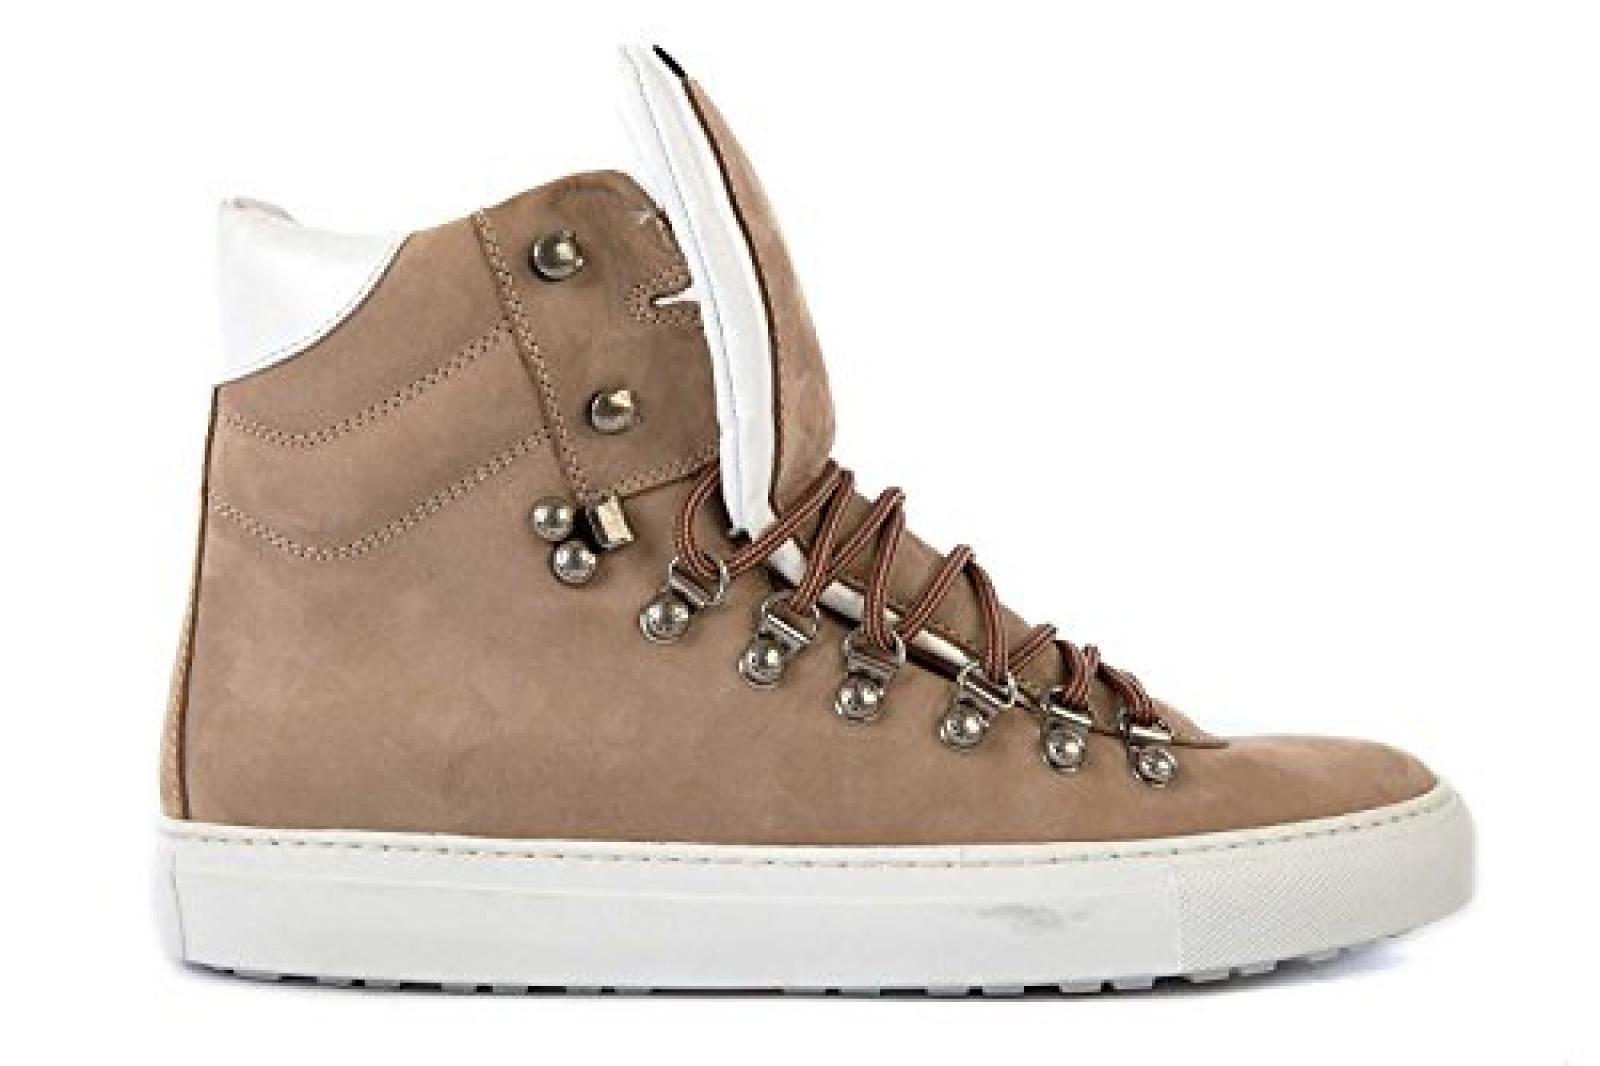 Dsquared2 Dsquared Herrenschuhe Herren Leder Schuhe High Sneakers beige